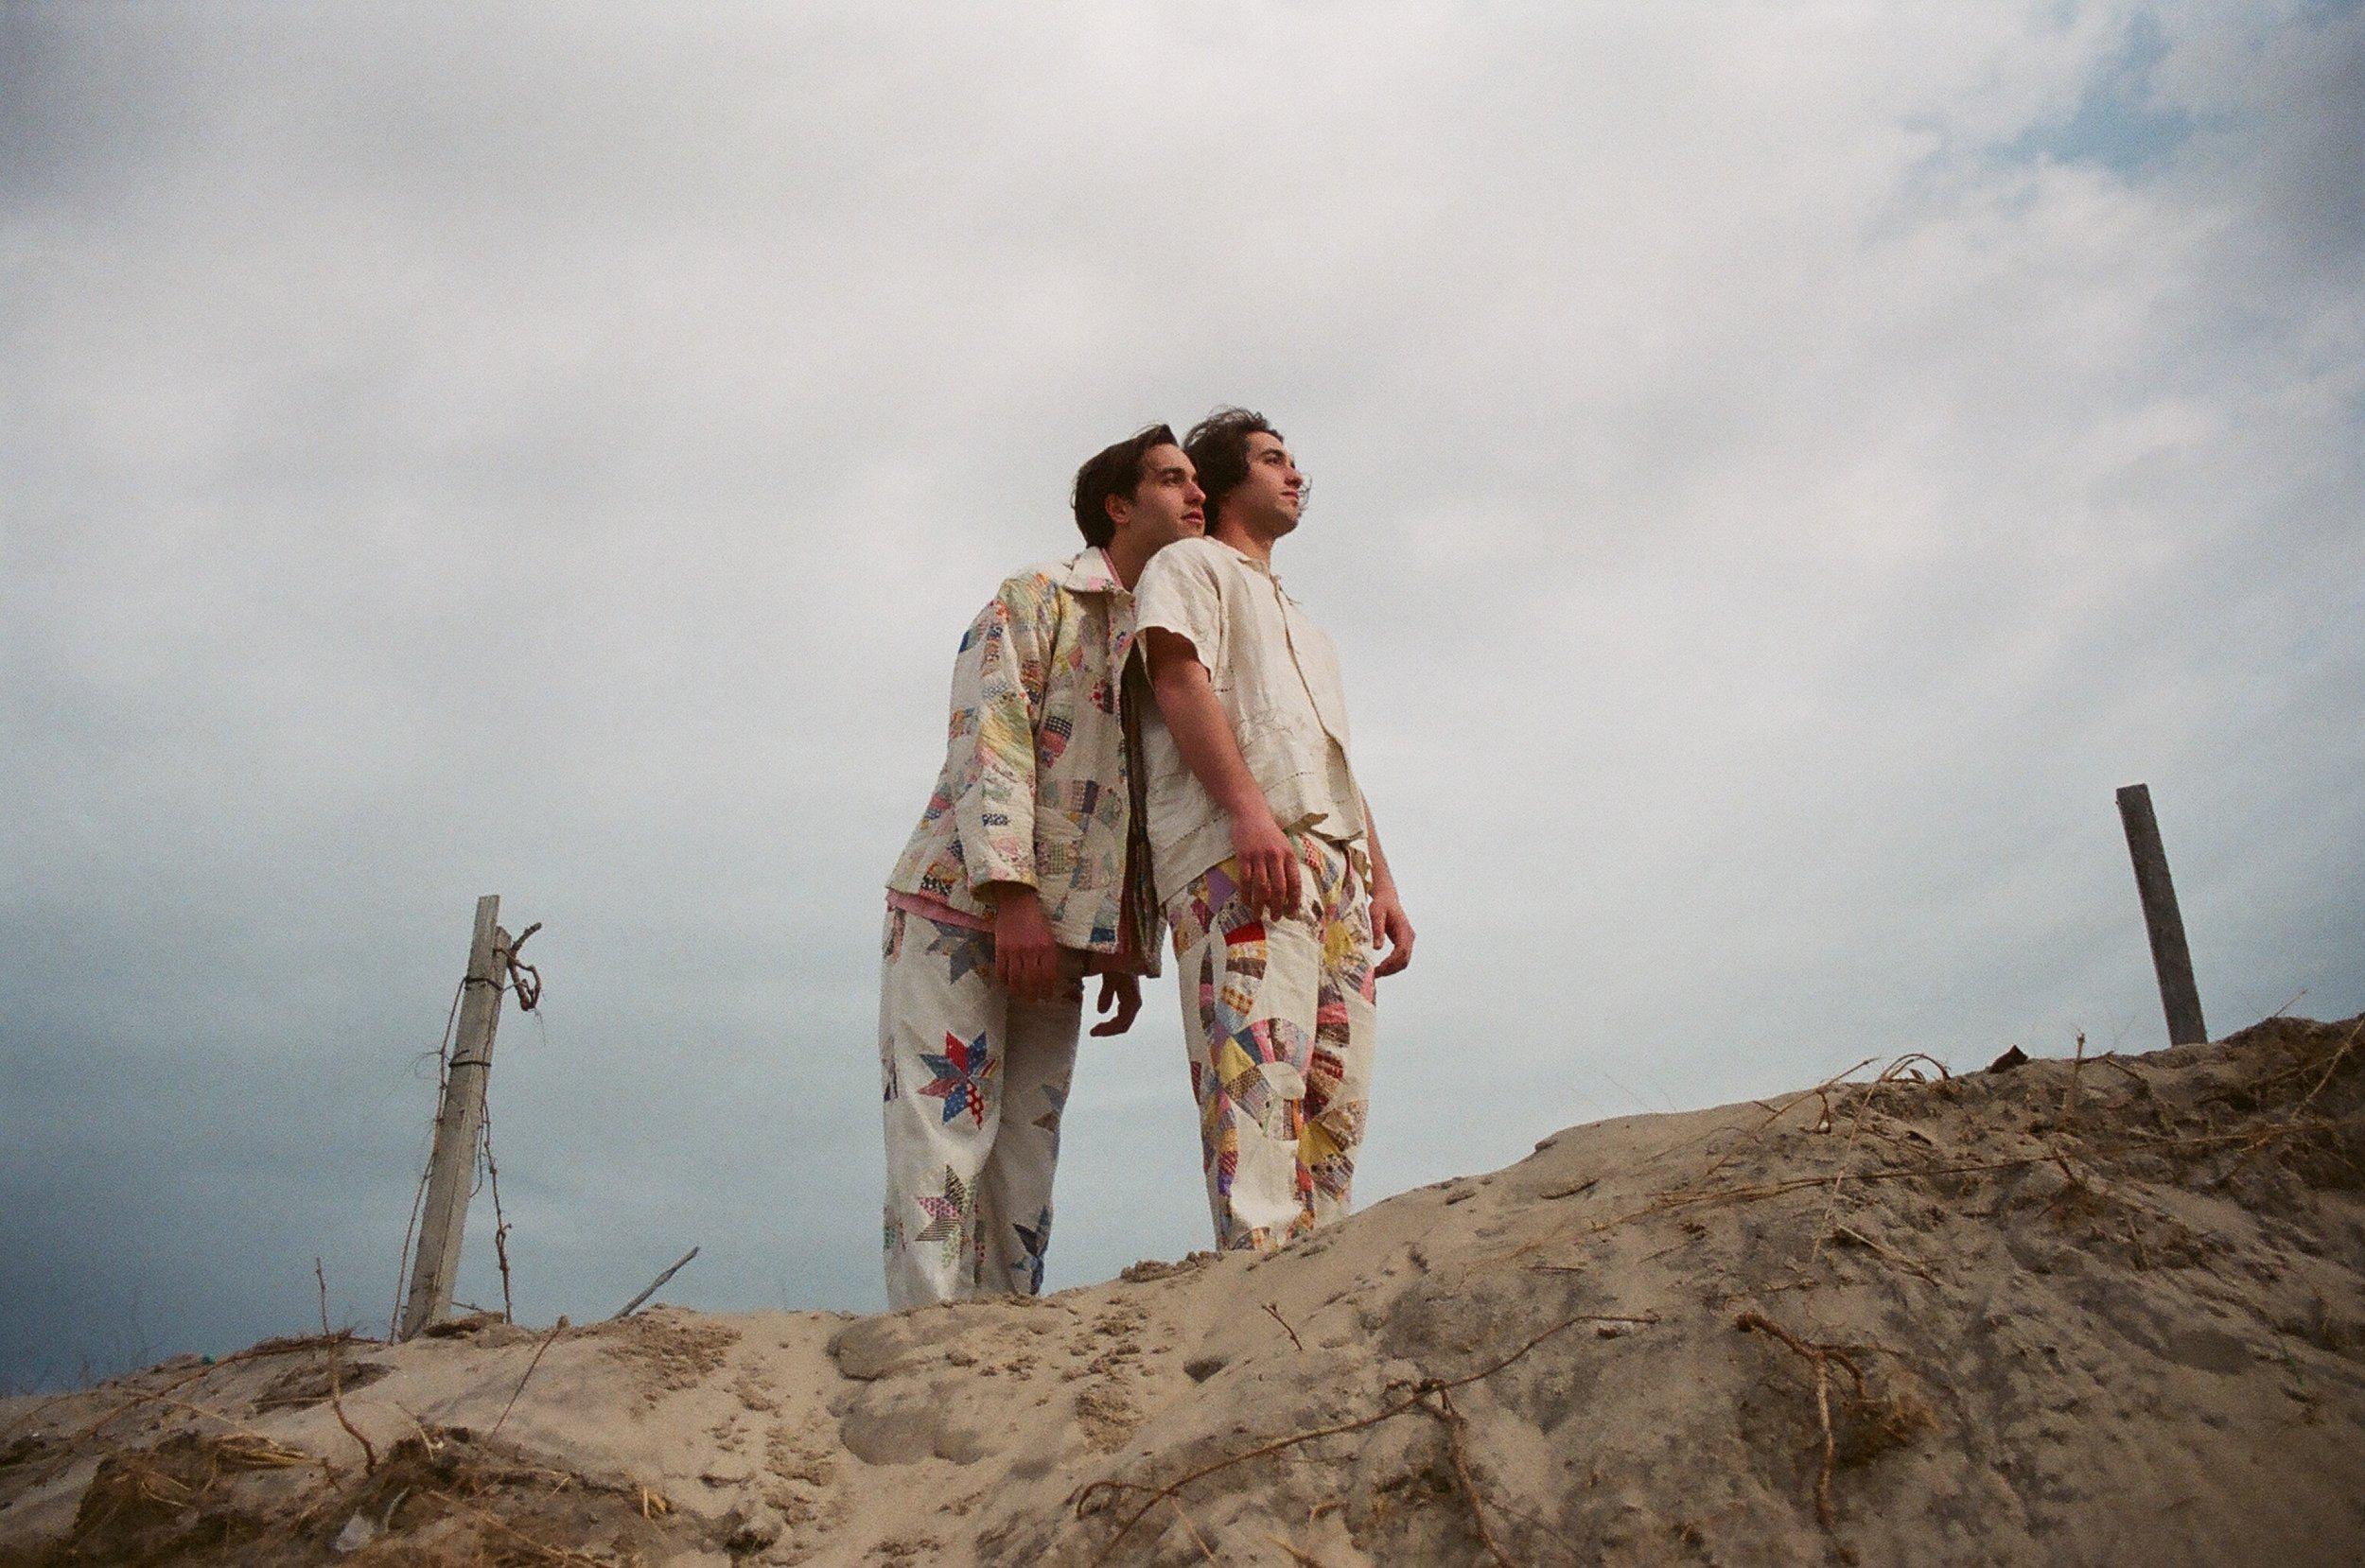 Chelsy-Mitchel-photographer-bode-nyc-fashion-beach-editorial-beachside-car-christian-matthew-rice-styling-coast.JPG